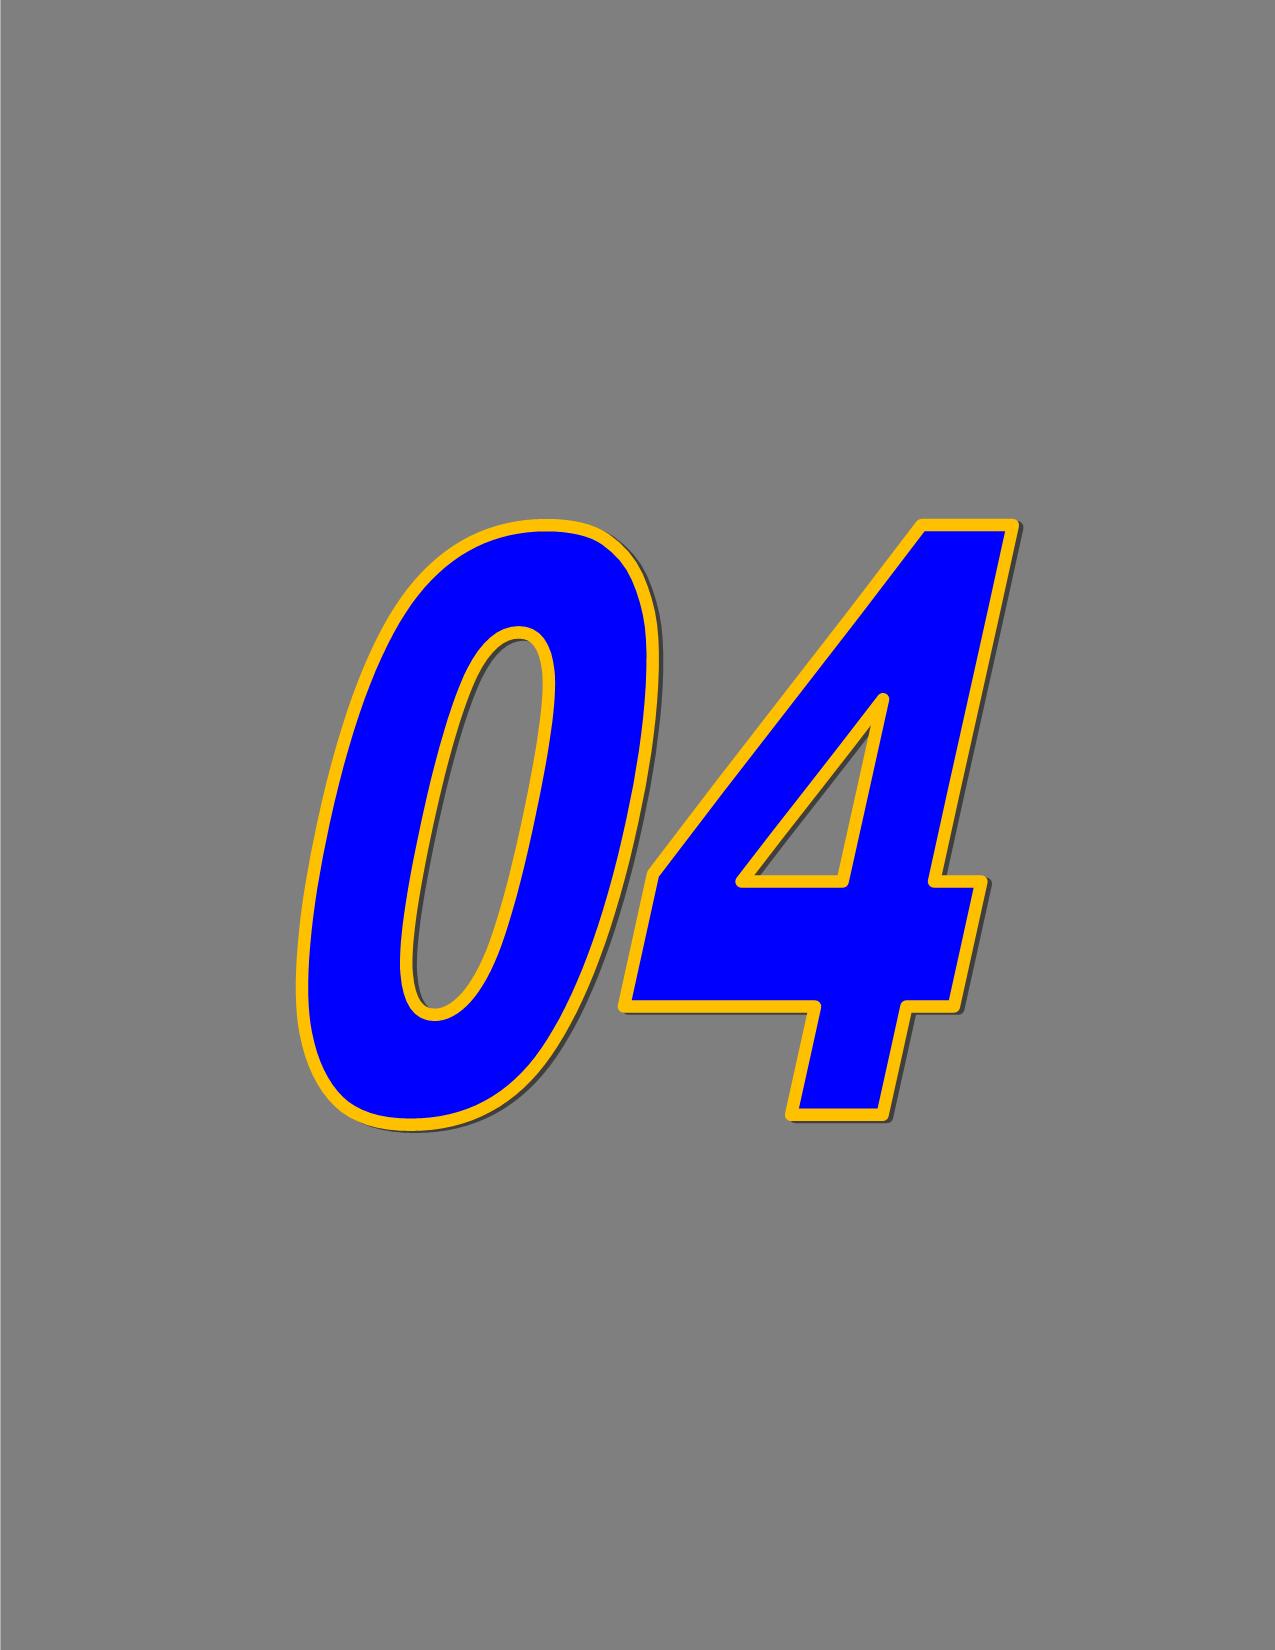 Number 04